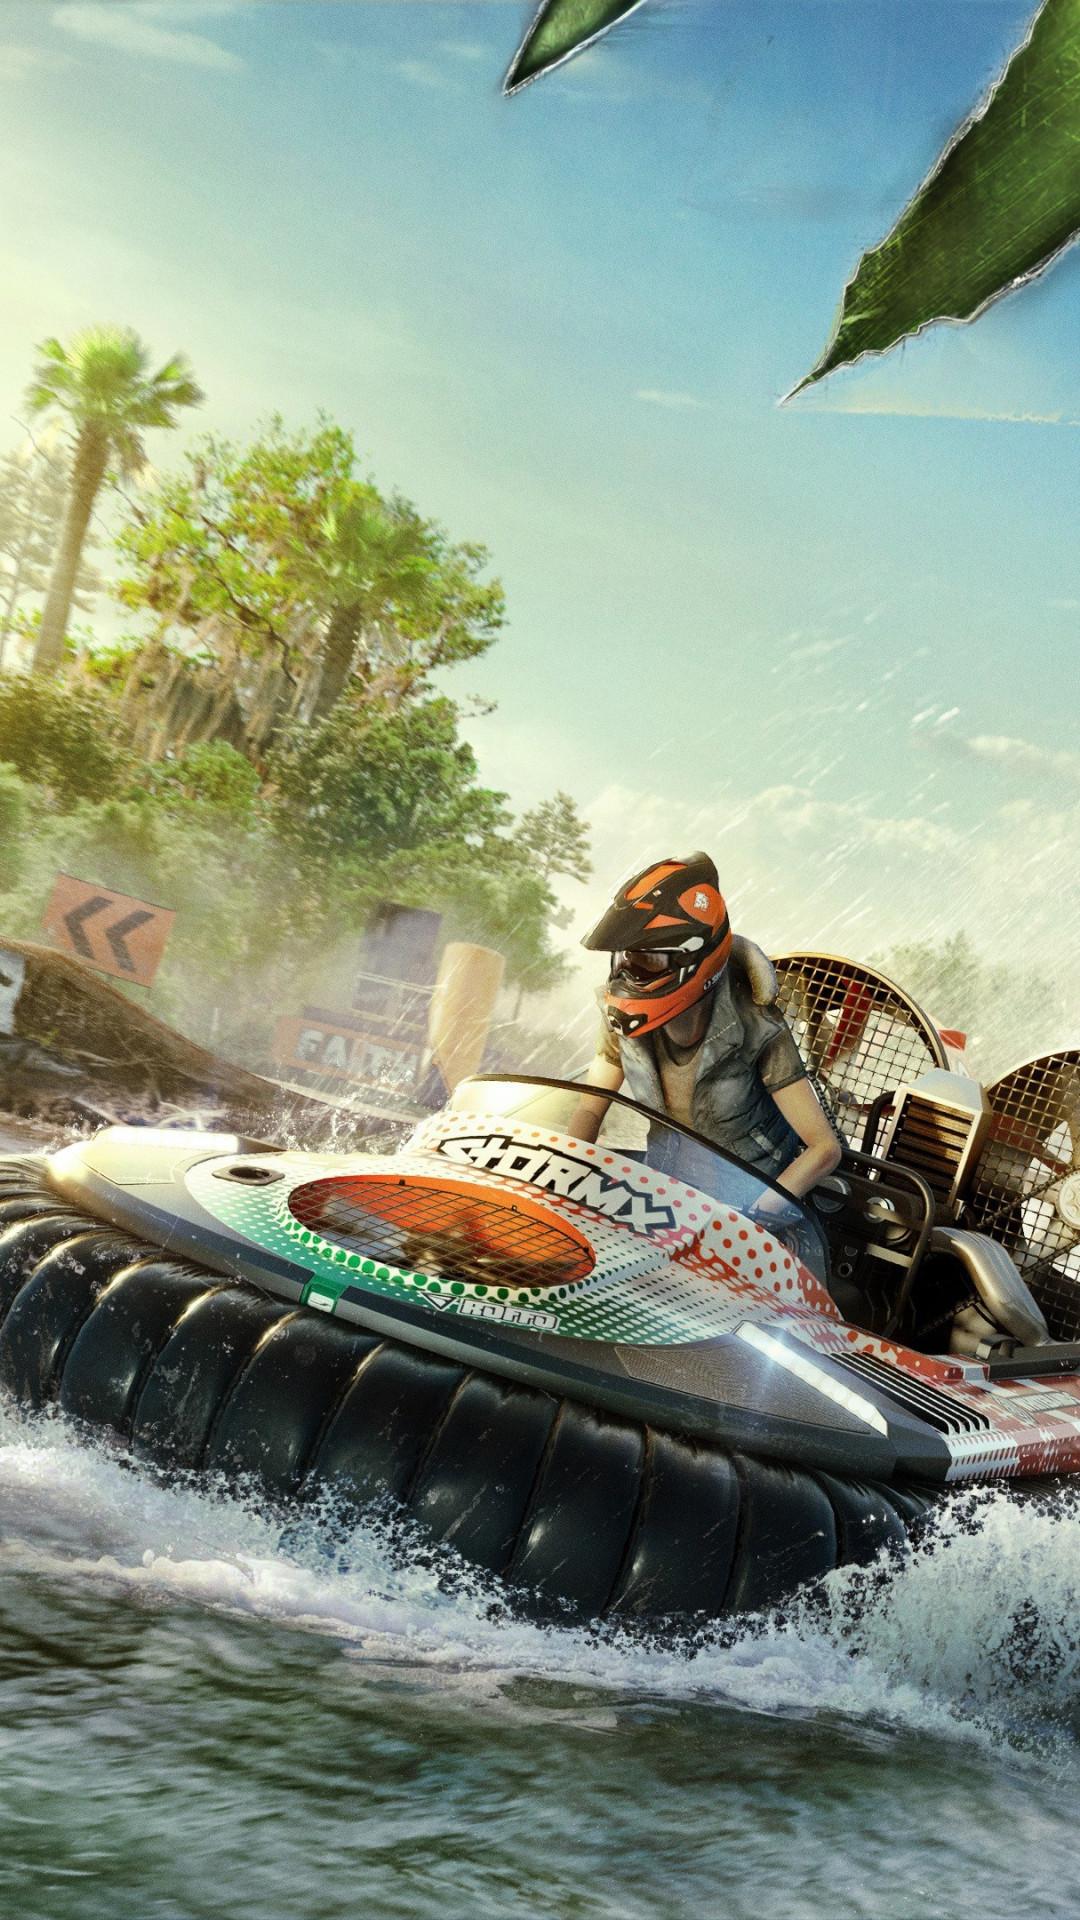 Download wallpaper: Gator Rush in The Crew 2 1080x1920